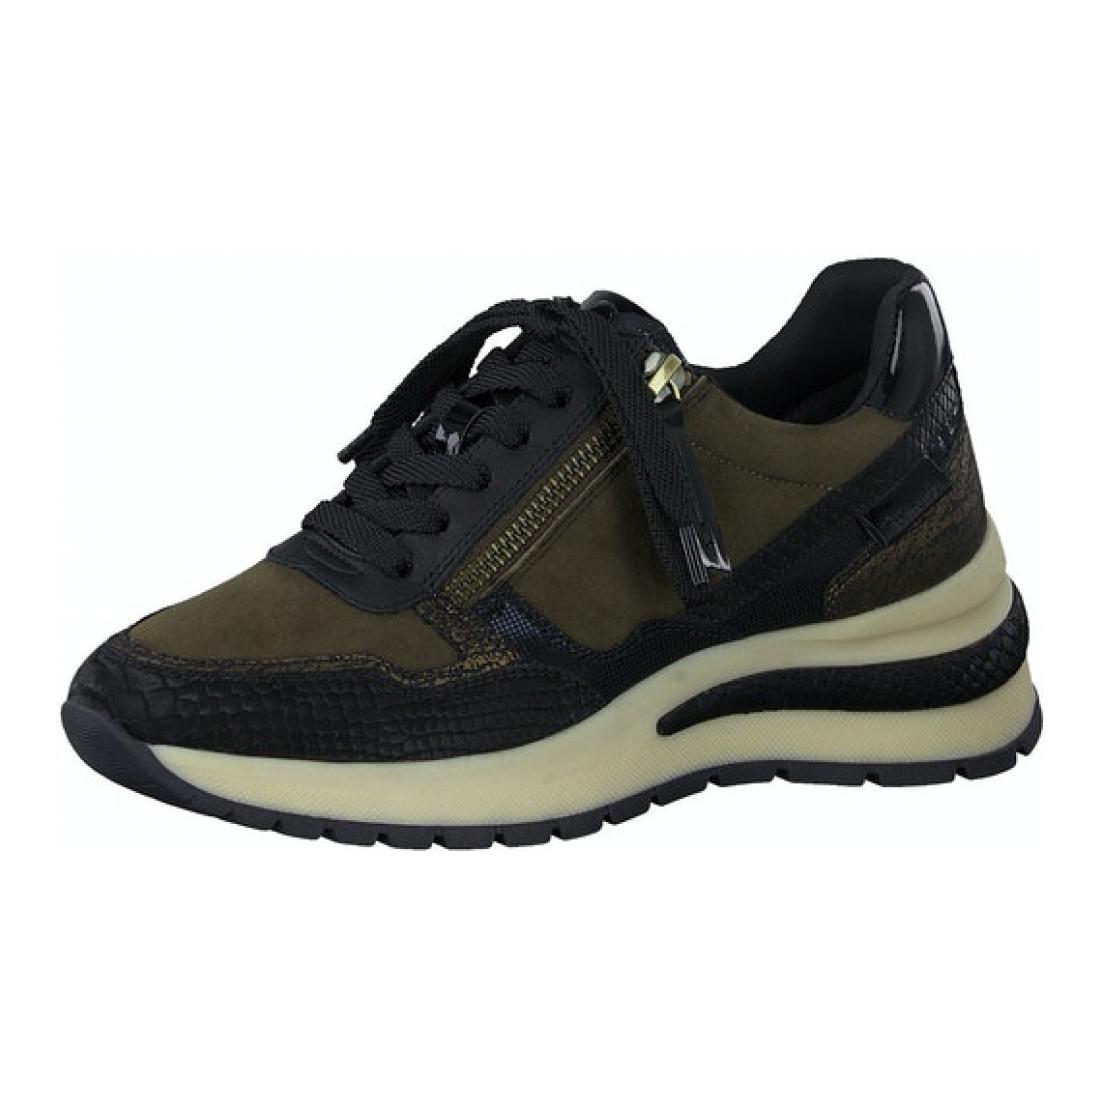 Tamaris Sneaker Olive Comb